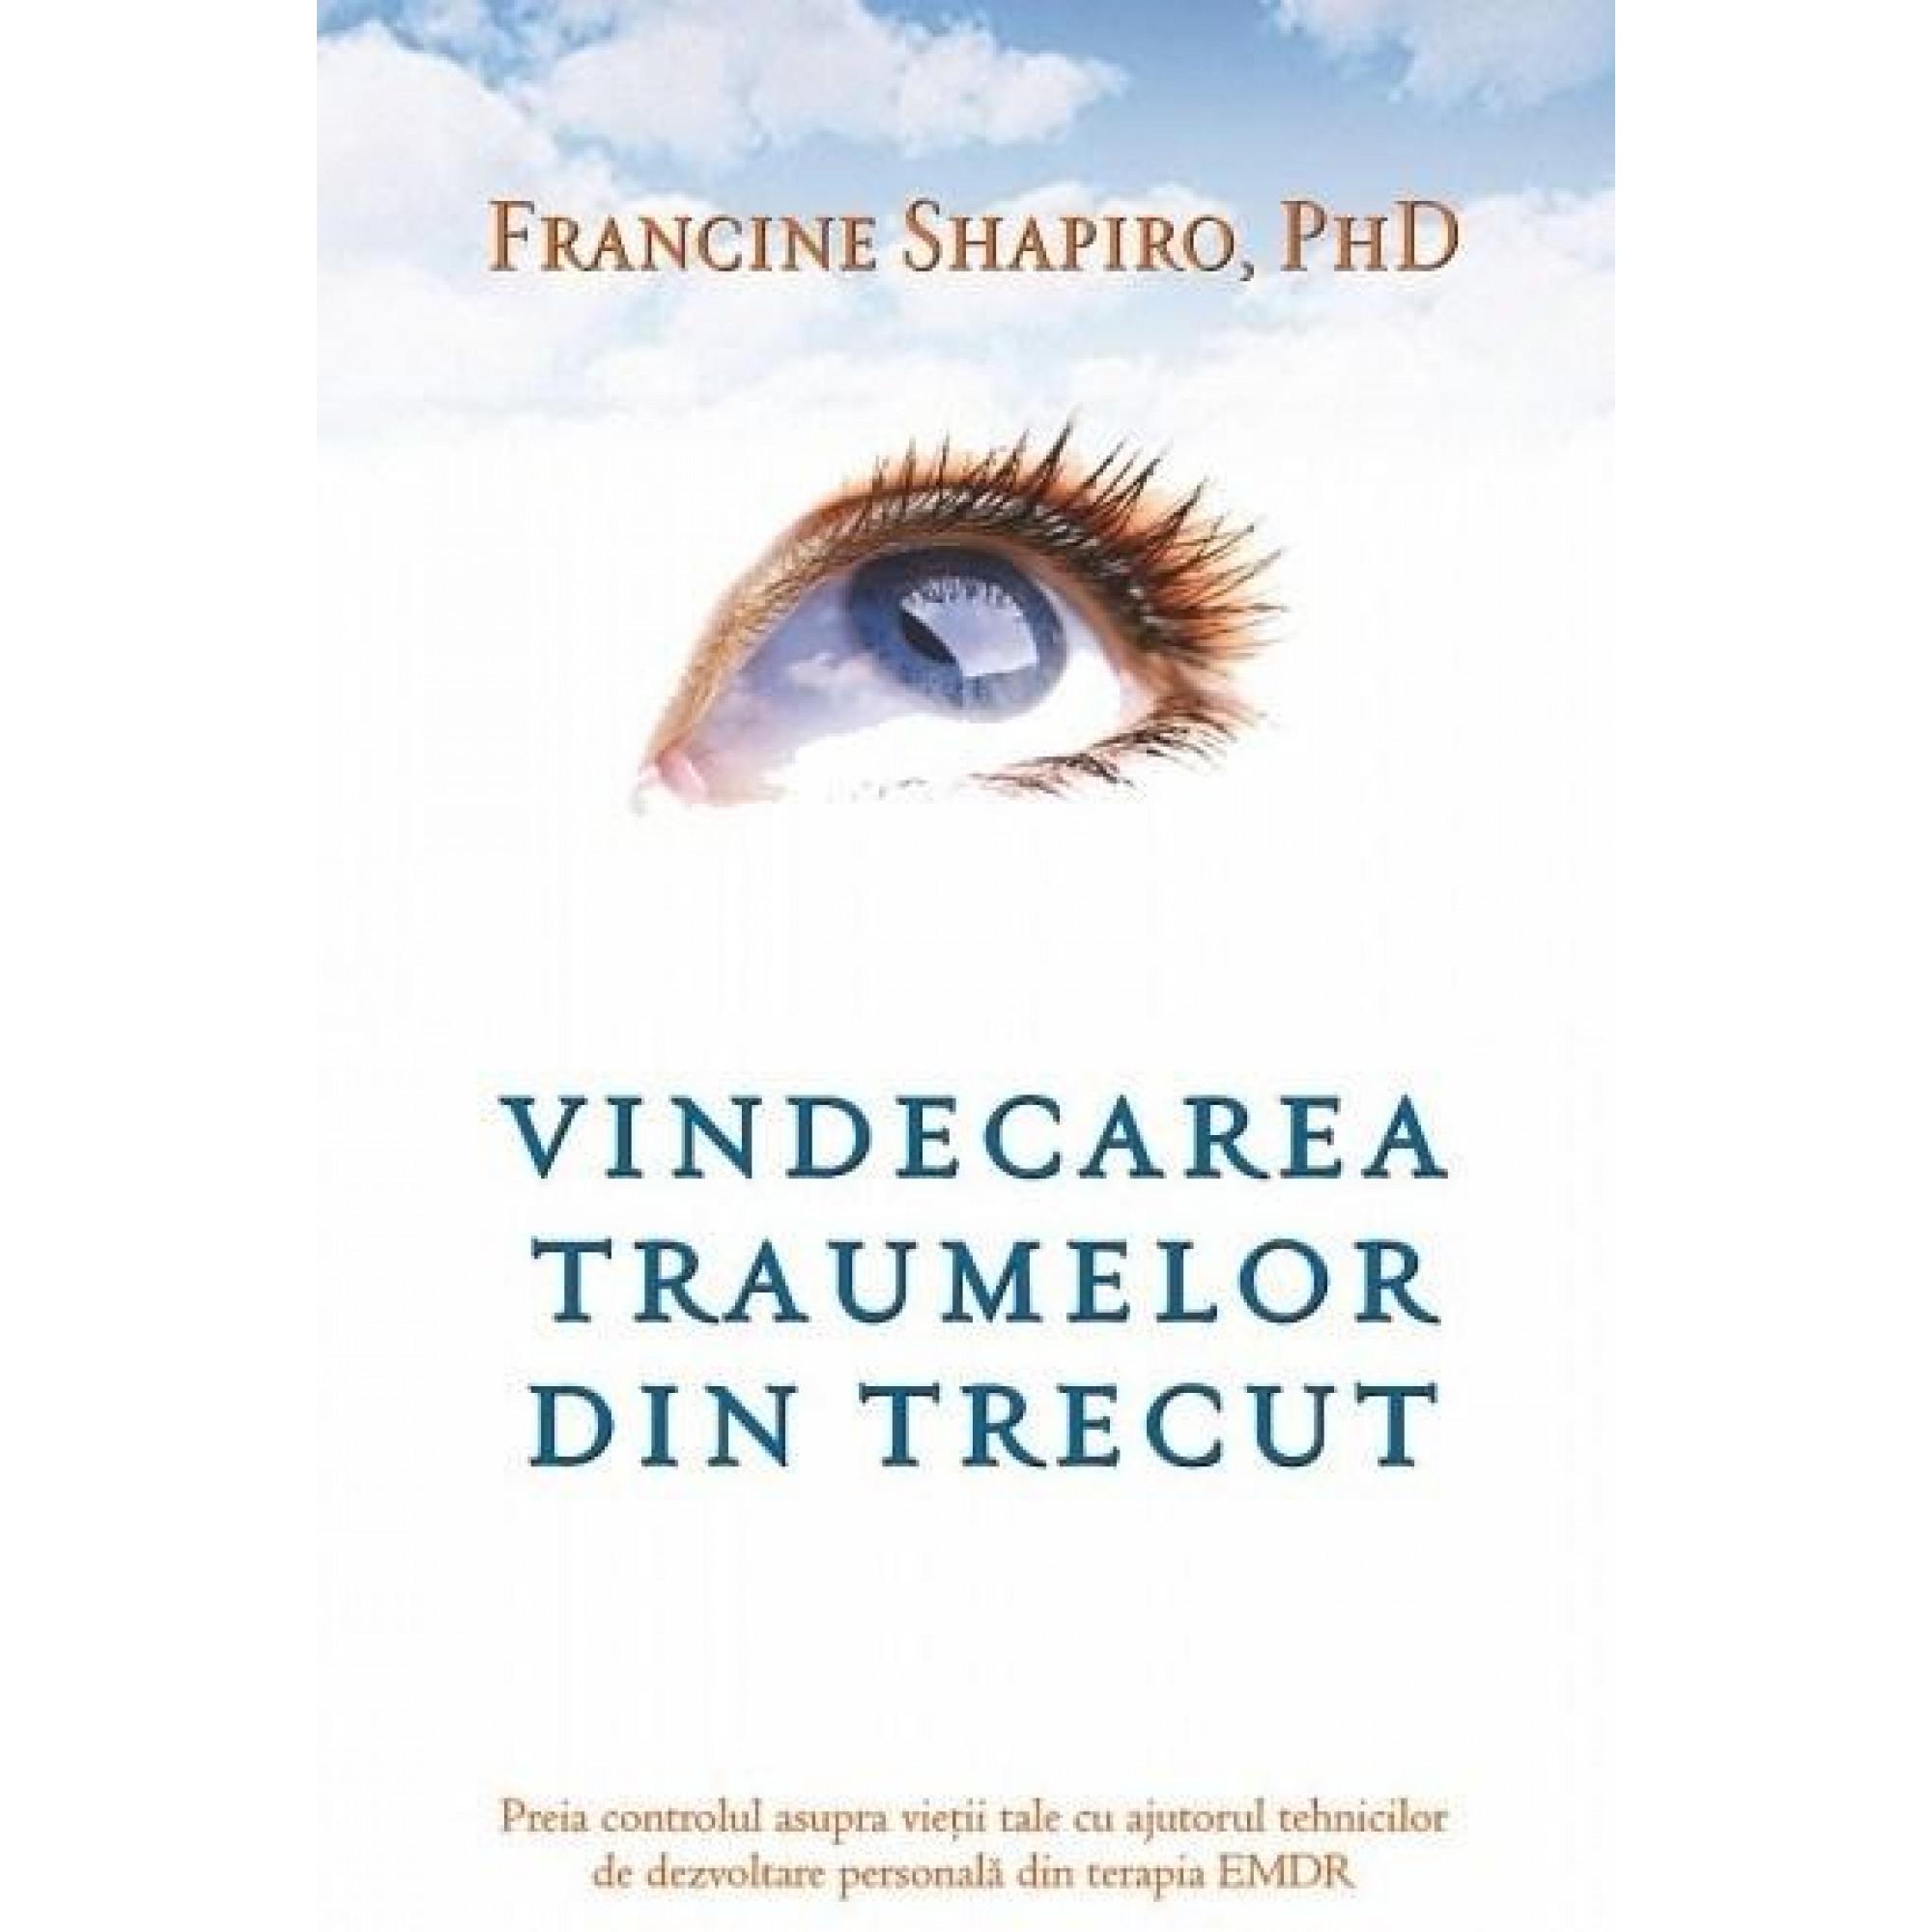 Vindecarea traumelor din trecut; Francine Shapiro